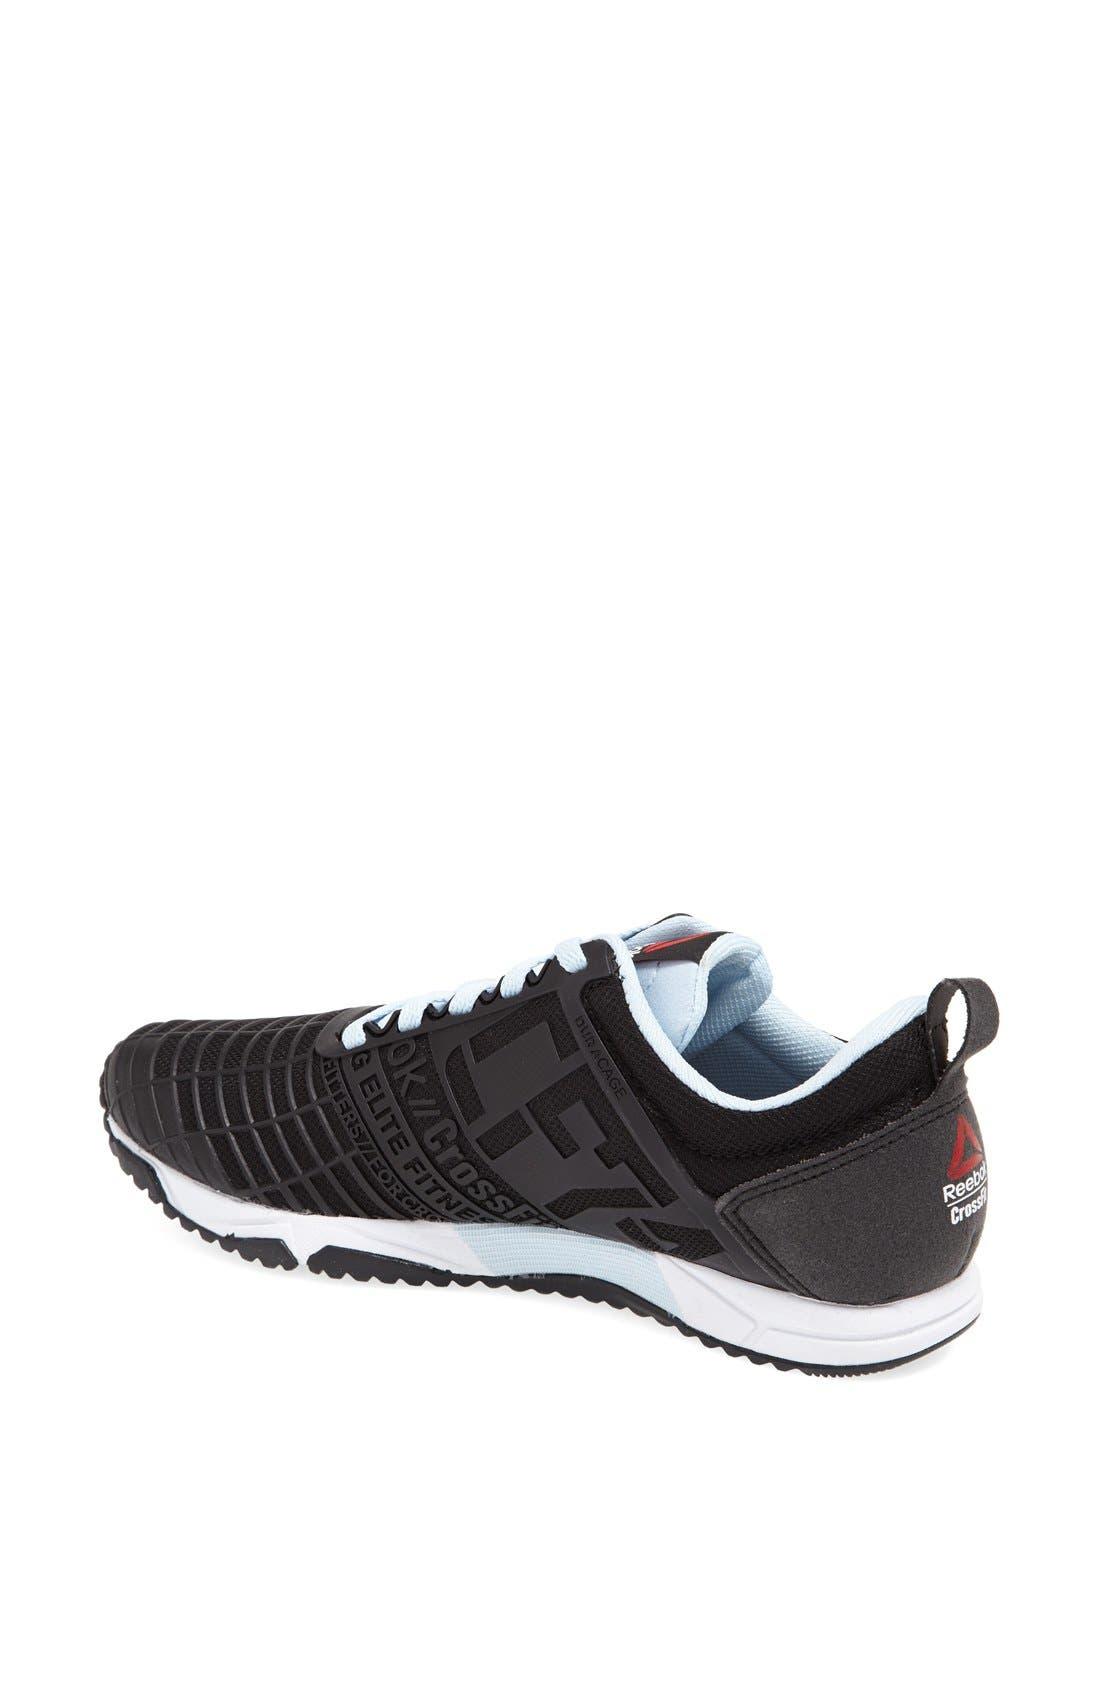 Alternate Image 2  - Reebok 'Crossfit Sprint' Training Shoe (Women)